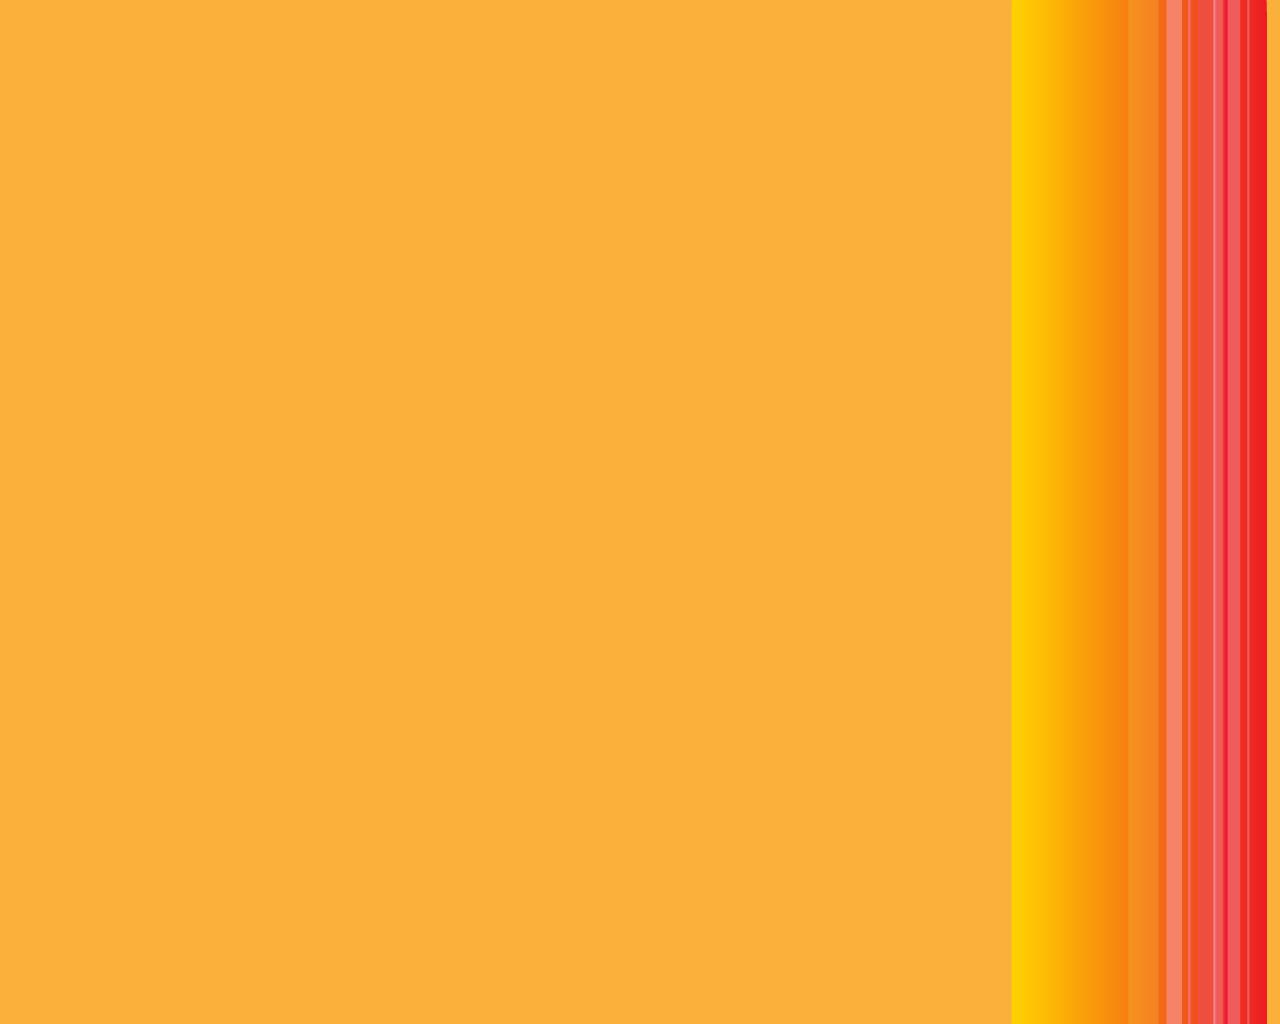 Orange Burgundy Stripes Power Point Orange Burgundy image PPT Backgrounds